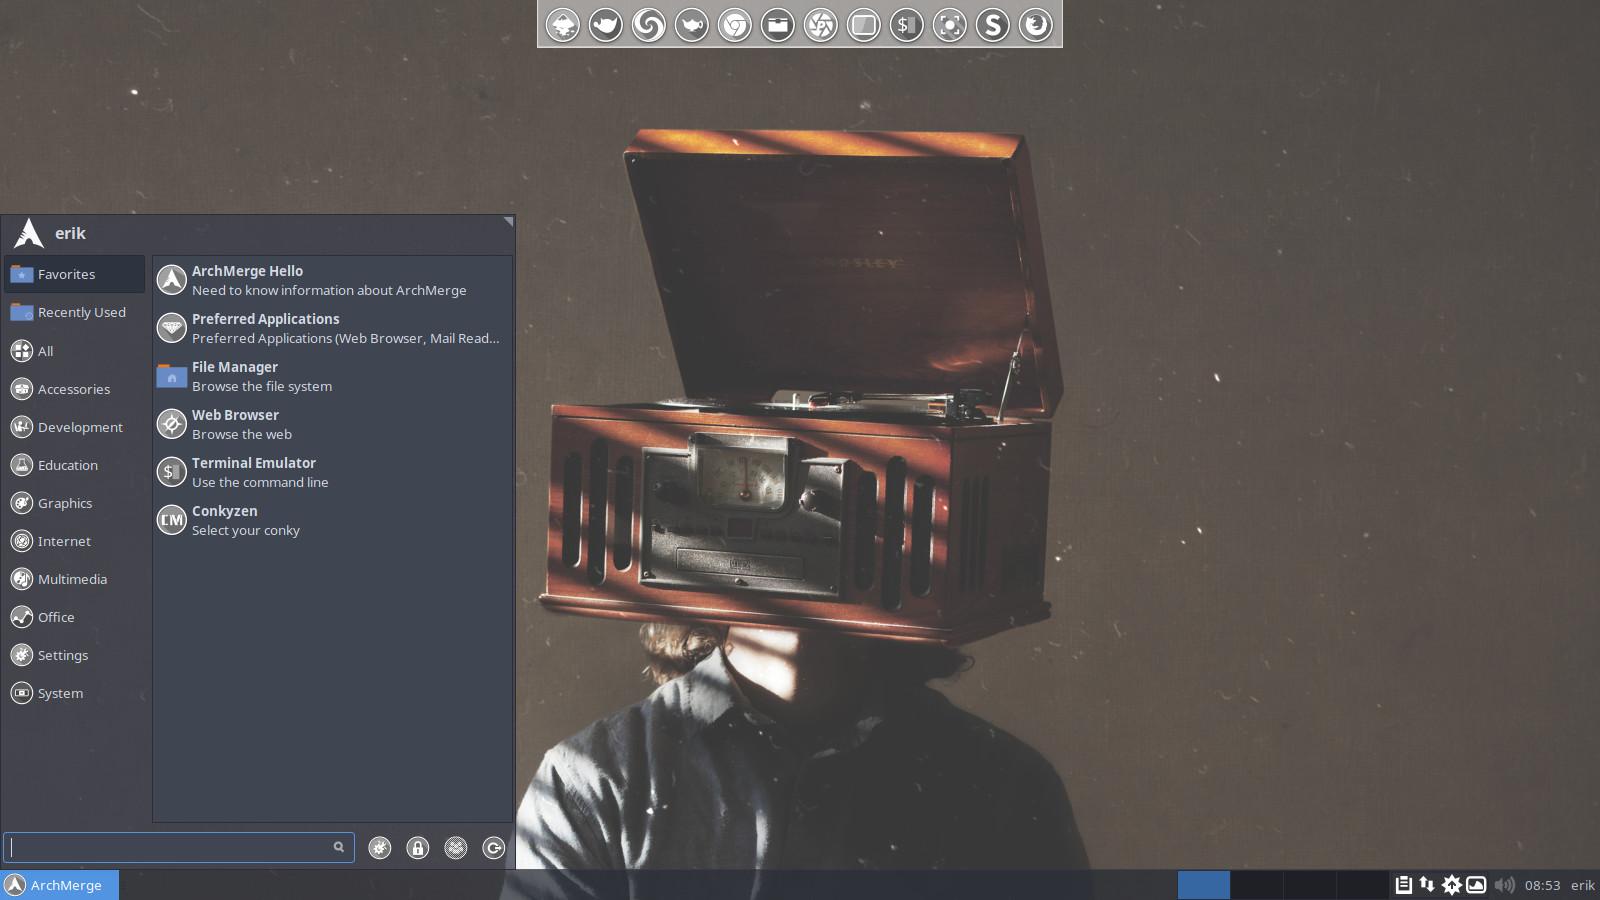 ArchMerge Kirk Release 6.3